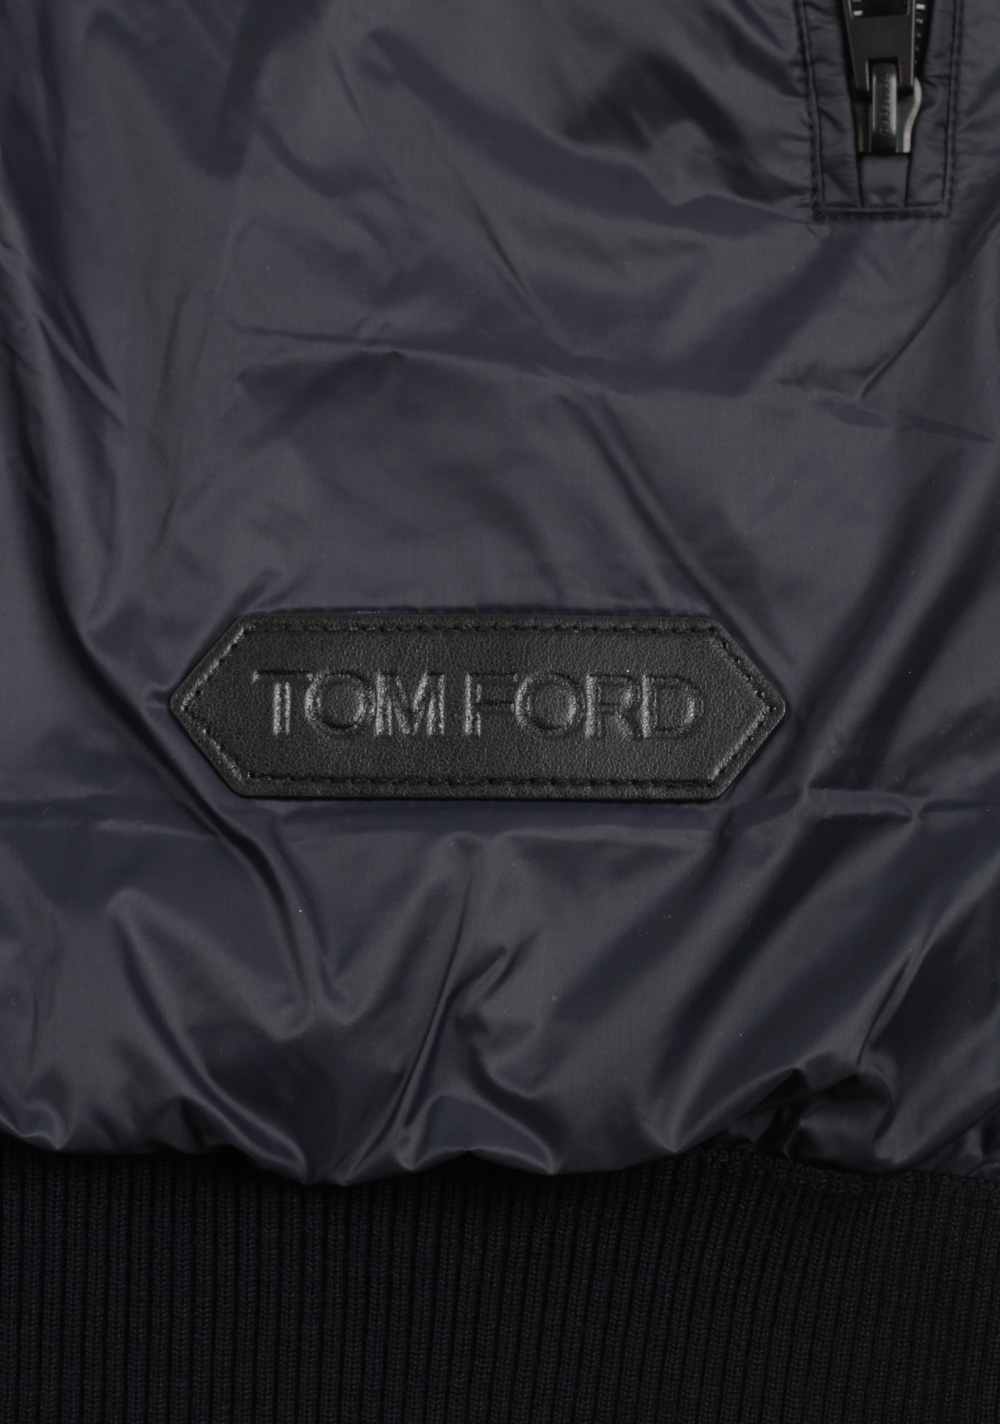 TOM FORD Blue James Bond Spectre Bomber Jacket Size 54 / 44R U.S. | Costume Limité